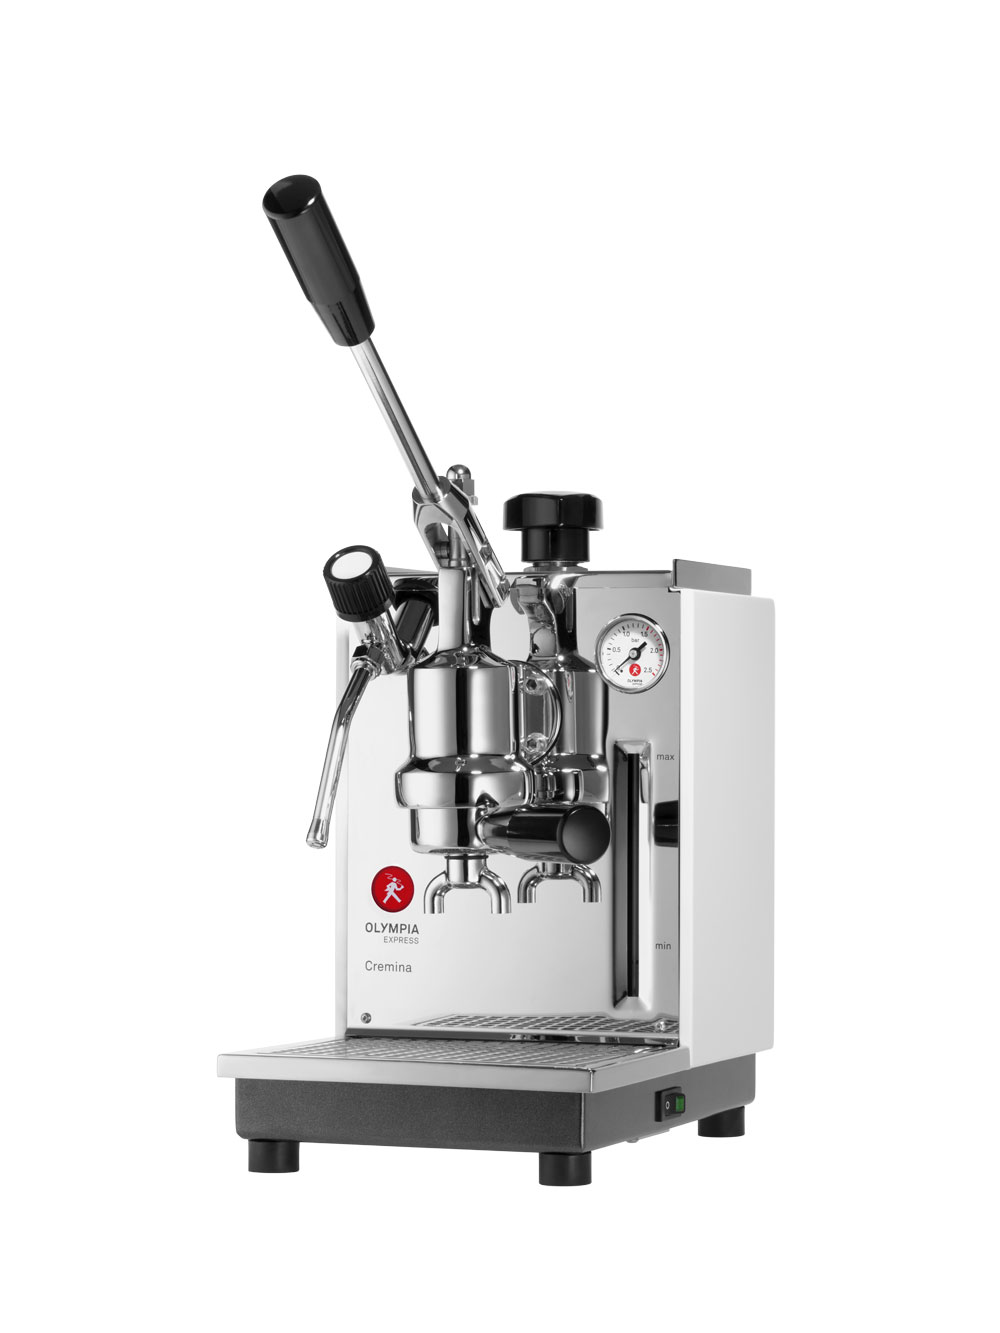 Olympia Cremina Handhebel Espressomaschine | © Olympia